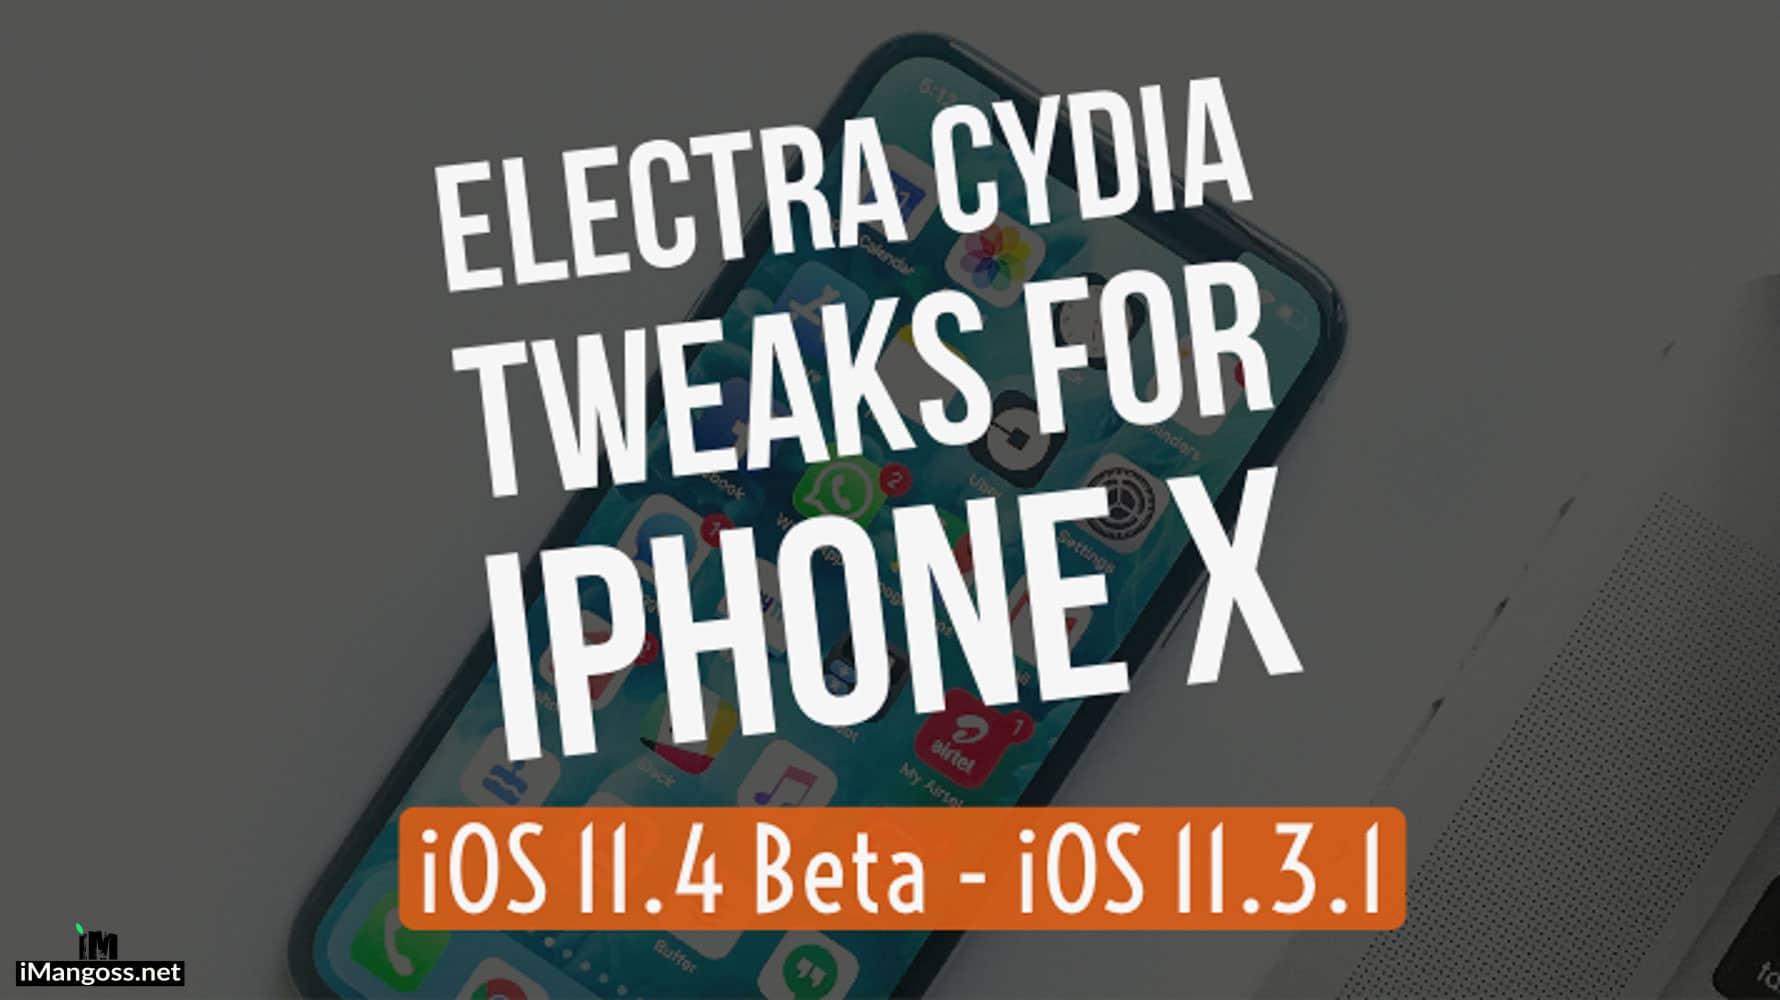 electra cydia tweaks for iPhone X